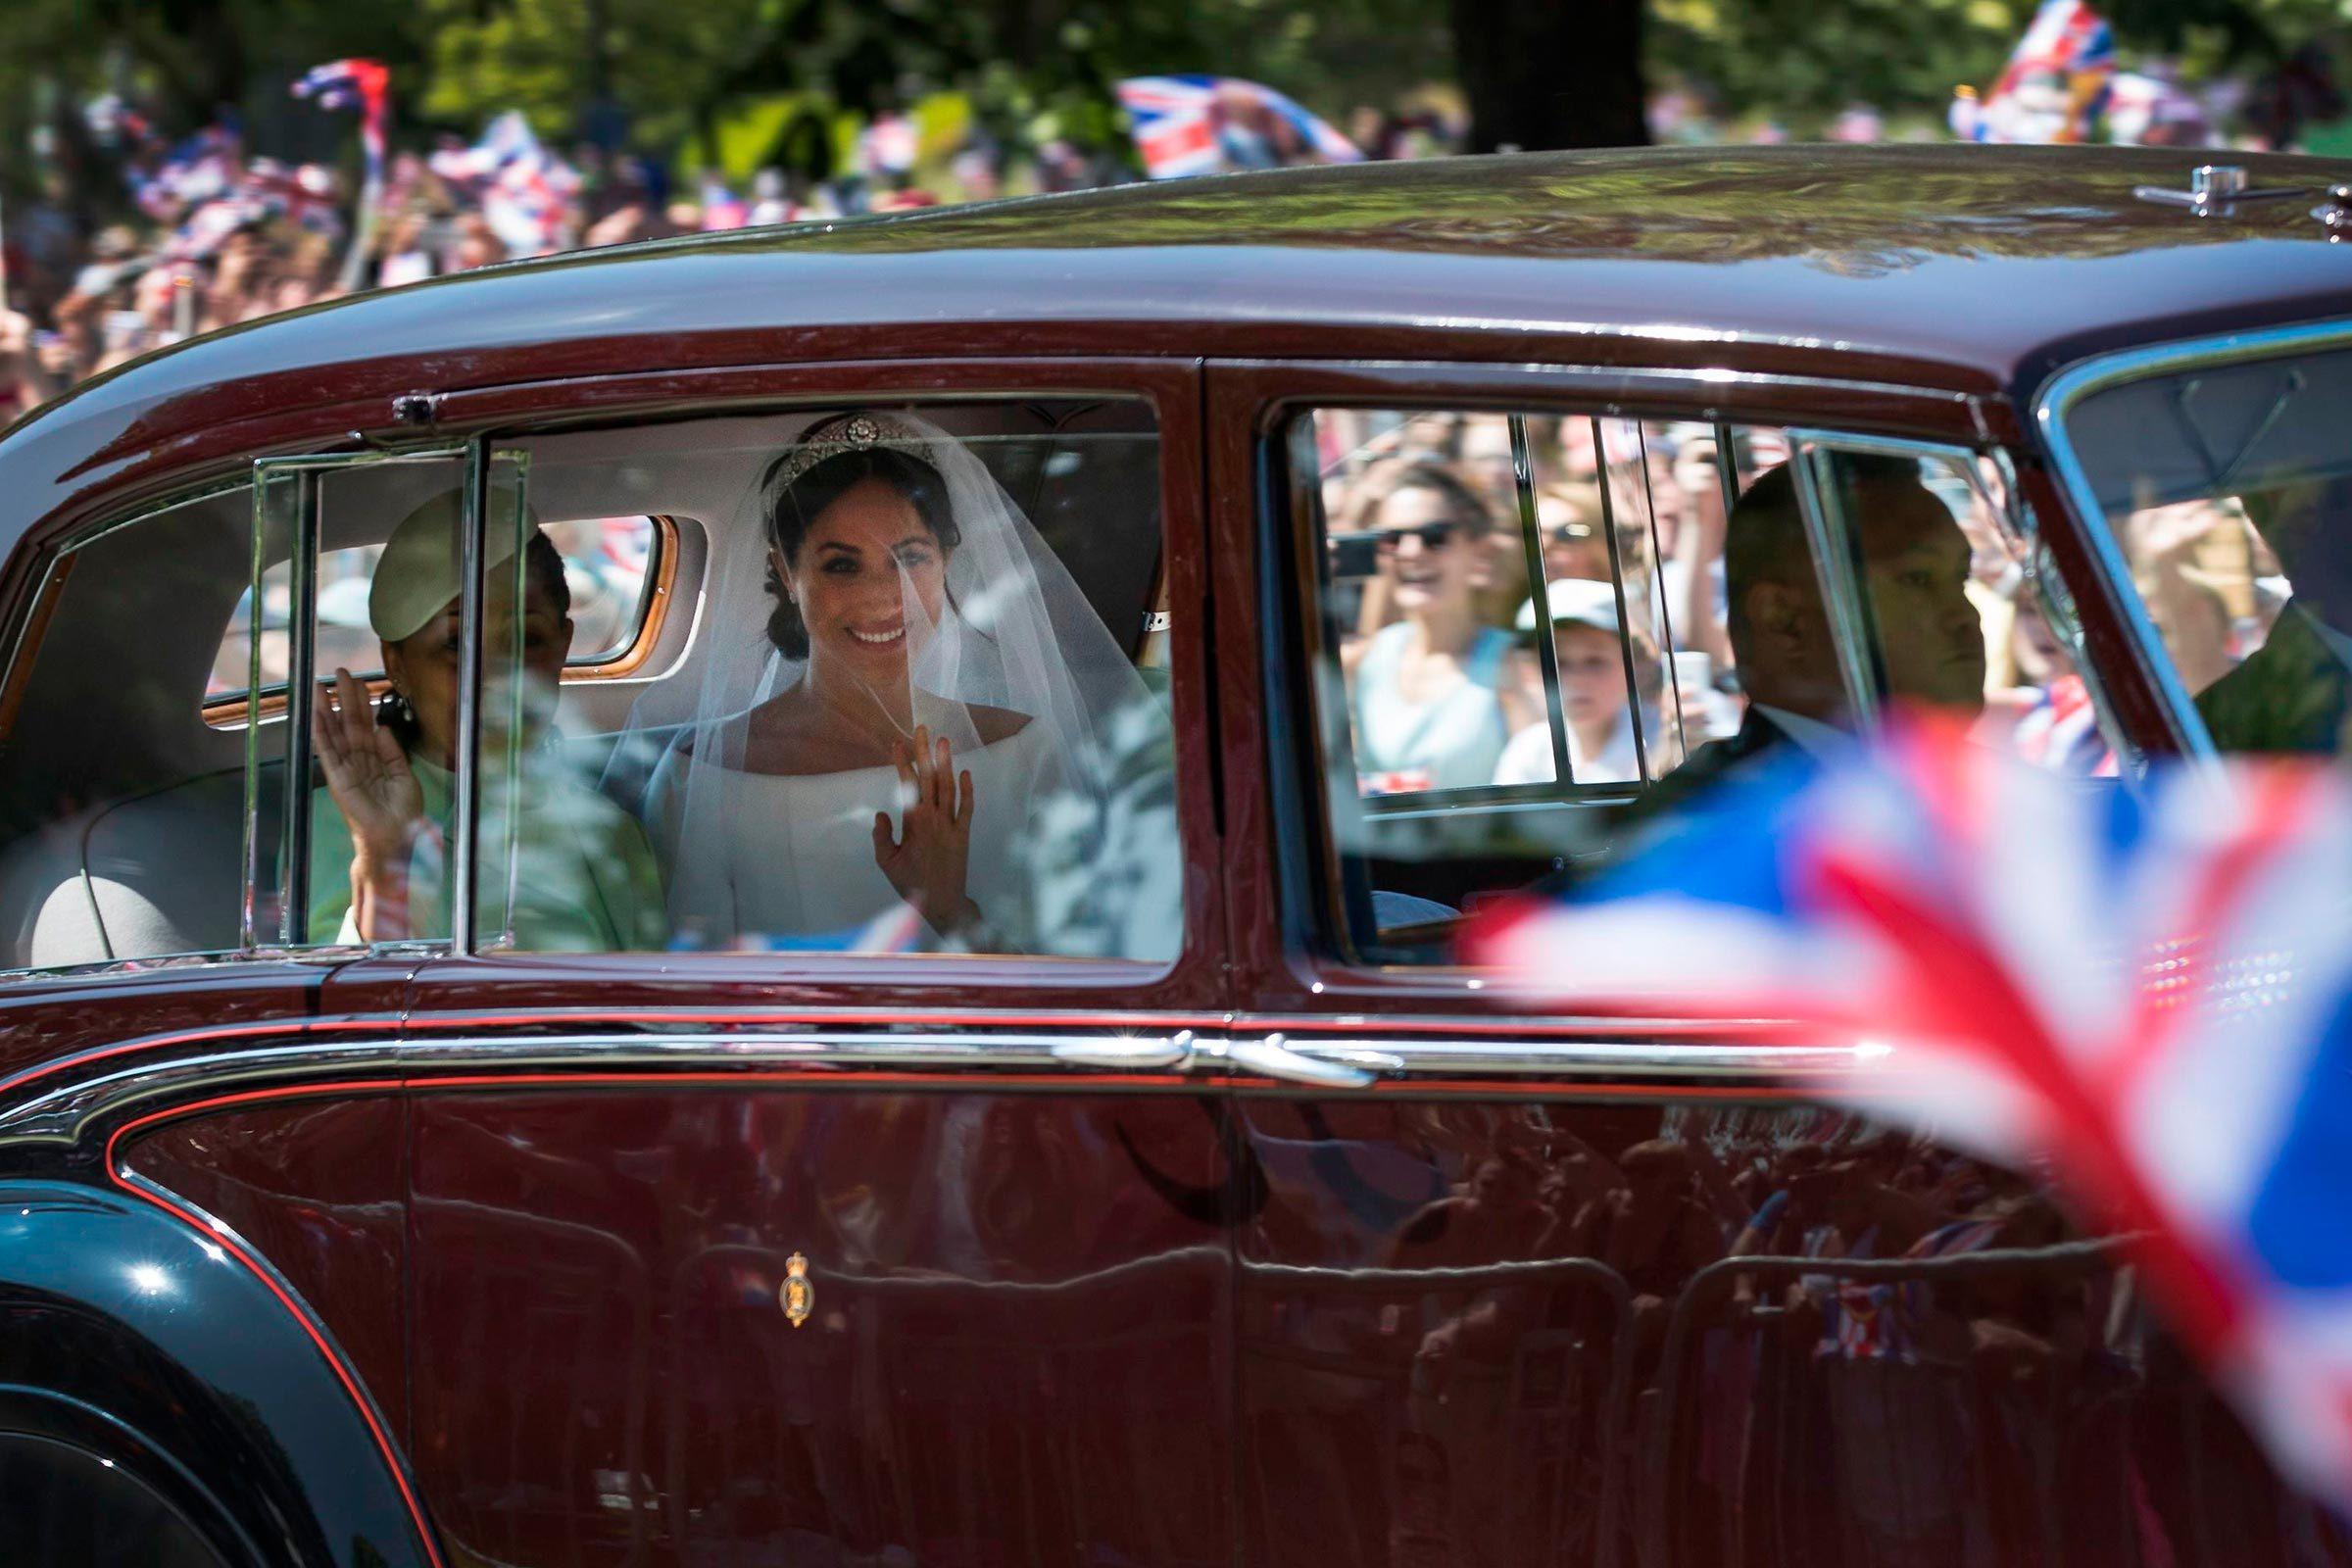 Meghan Markle arriving to wedding